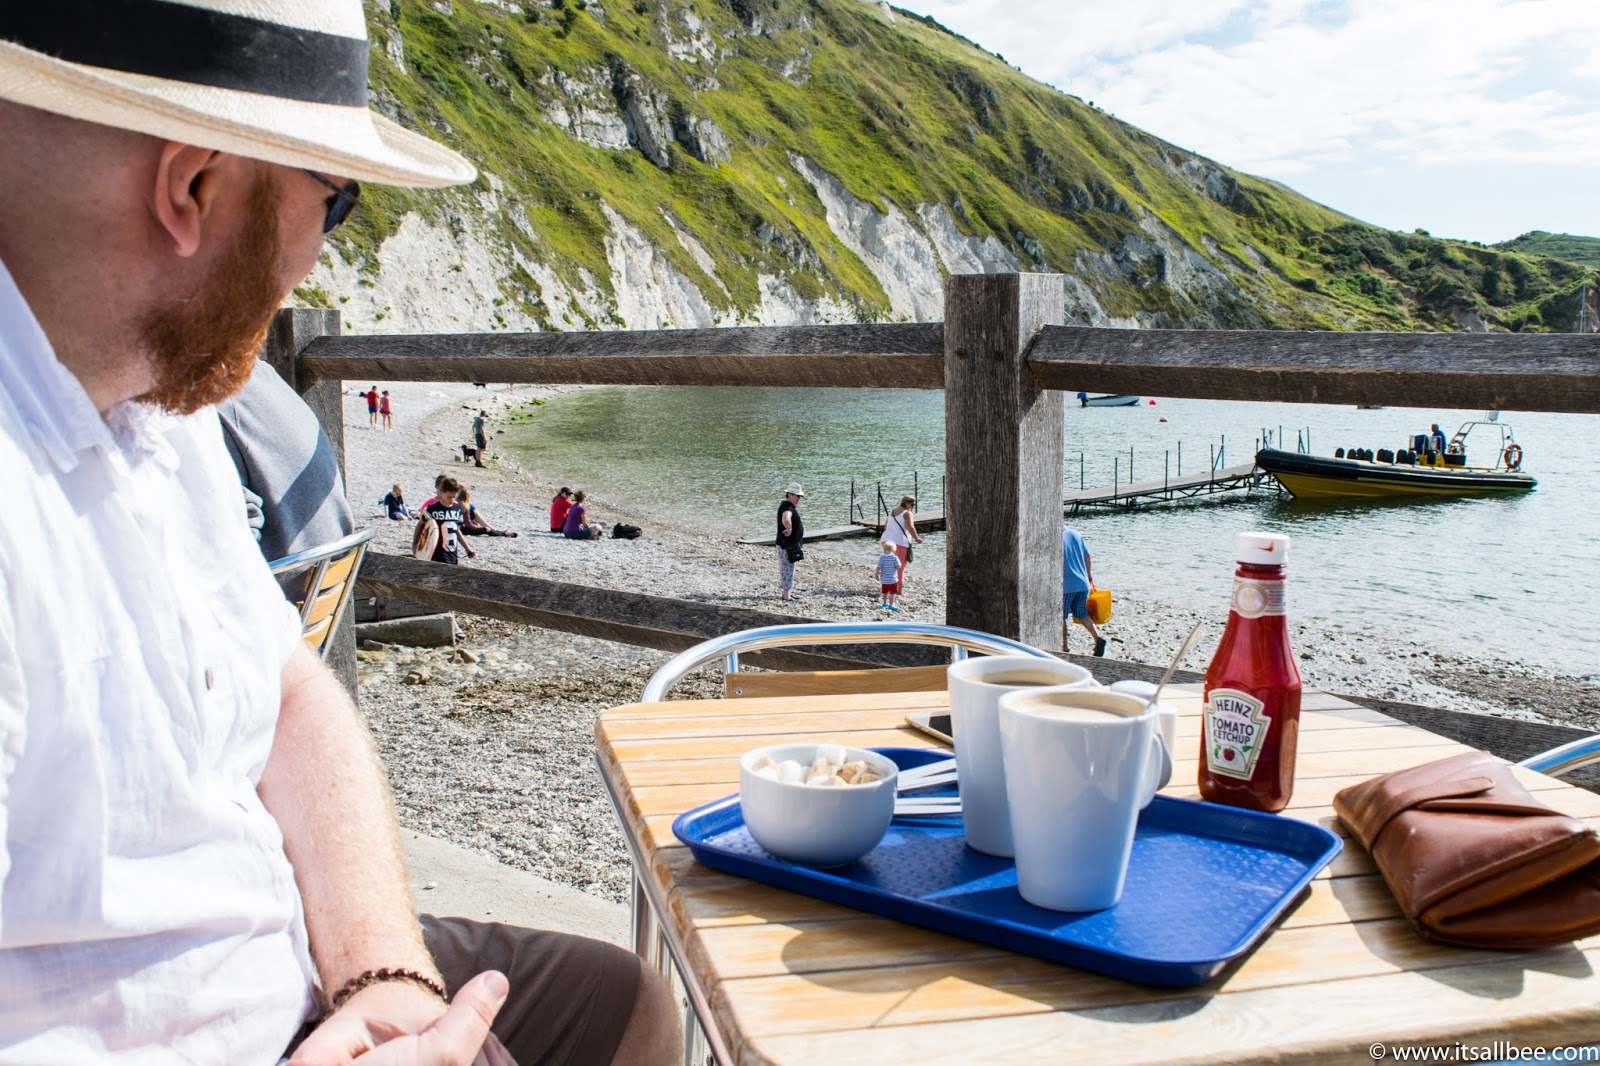 lulworth cove walks in Dorset England |lulworth cove beach cafe